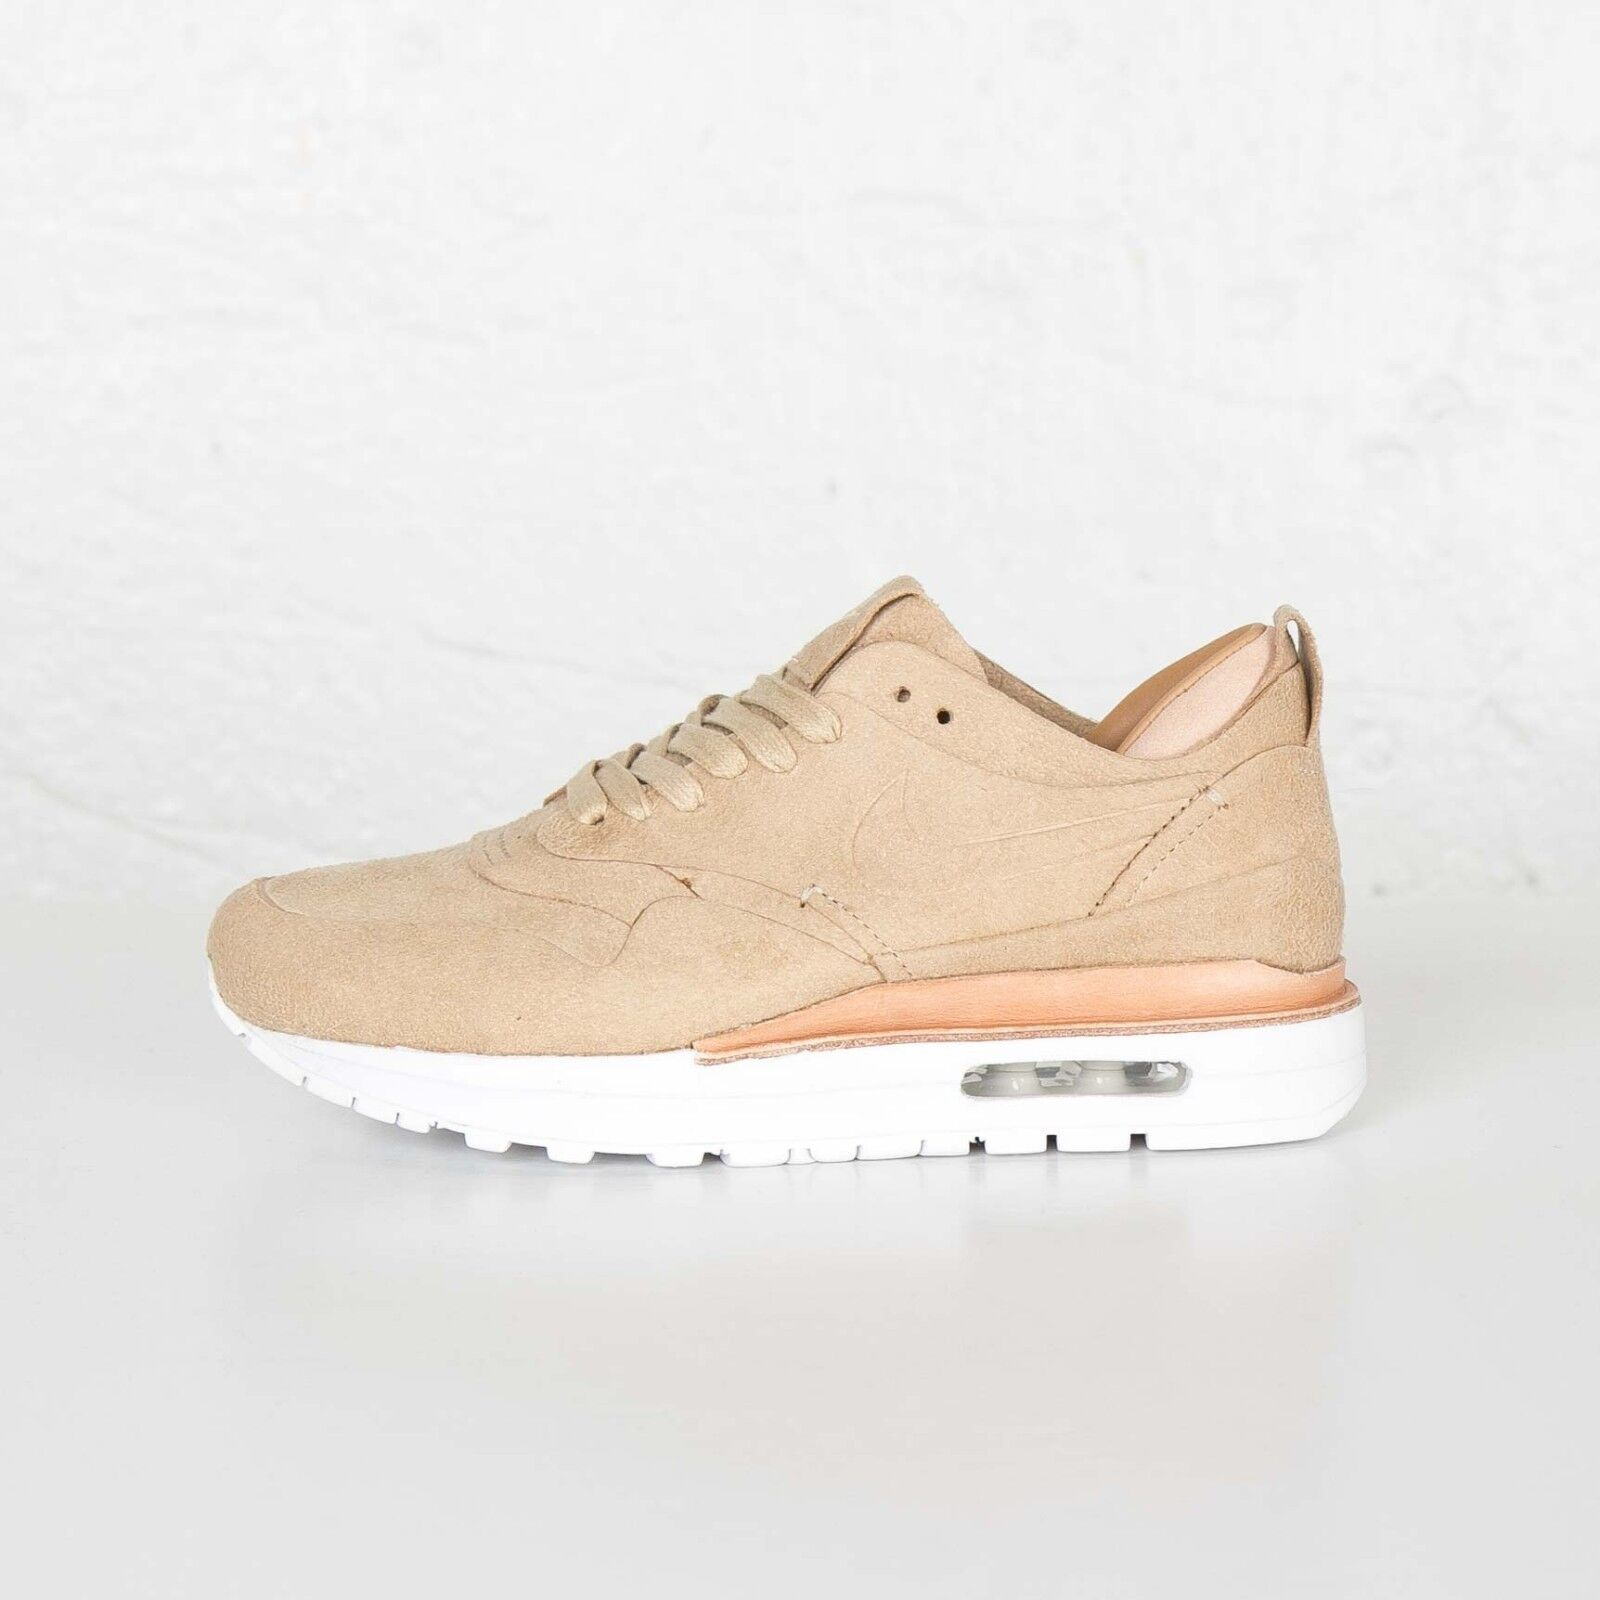 Nike Air Max 1 Royal Women's Shoes Linen White 525322 009